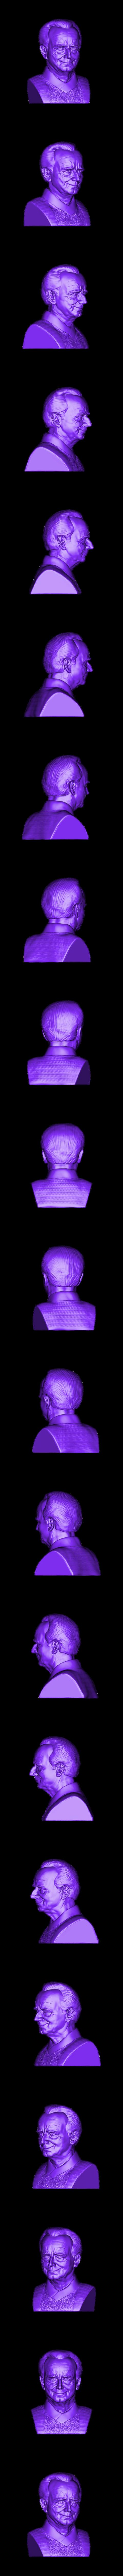 buste.stl Download STL file PALPATINE • 3D print template, thierry3D